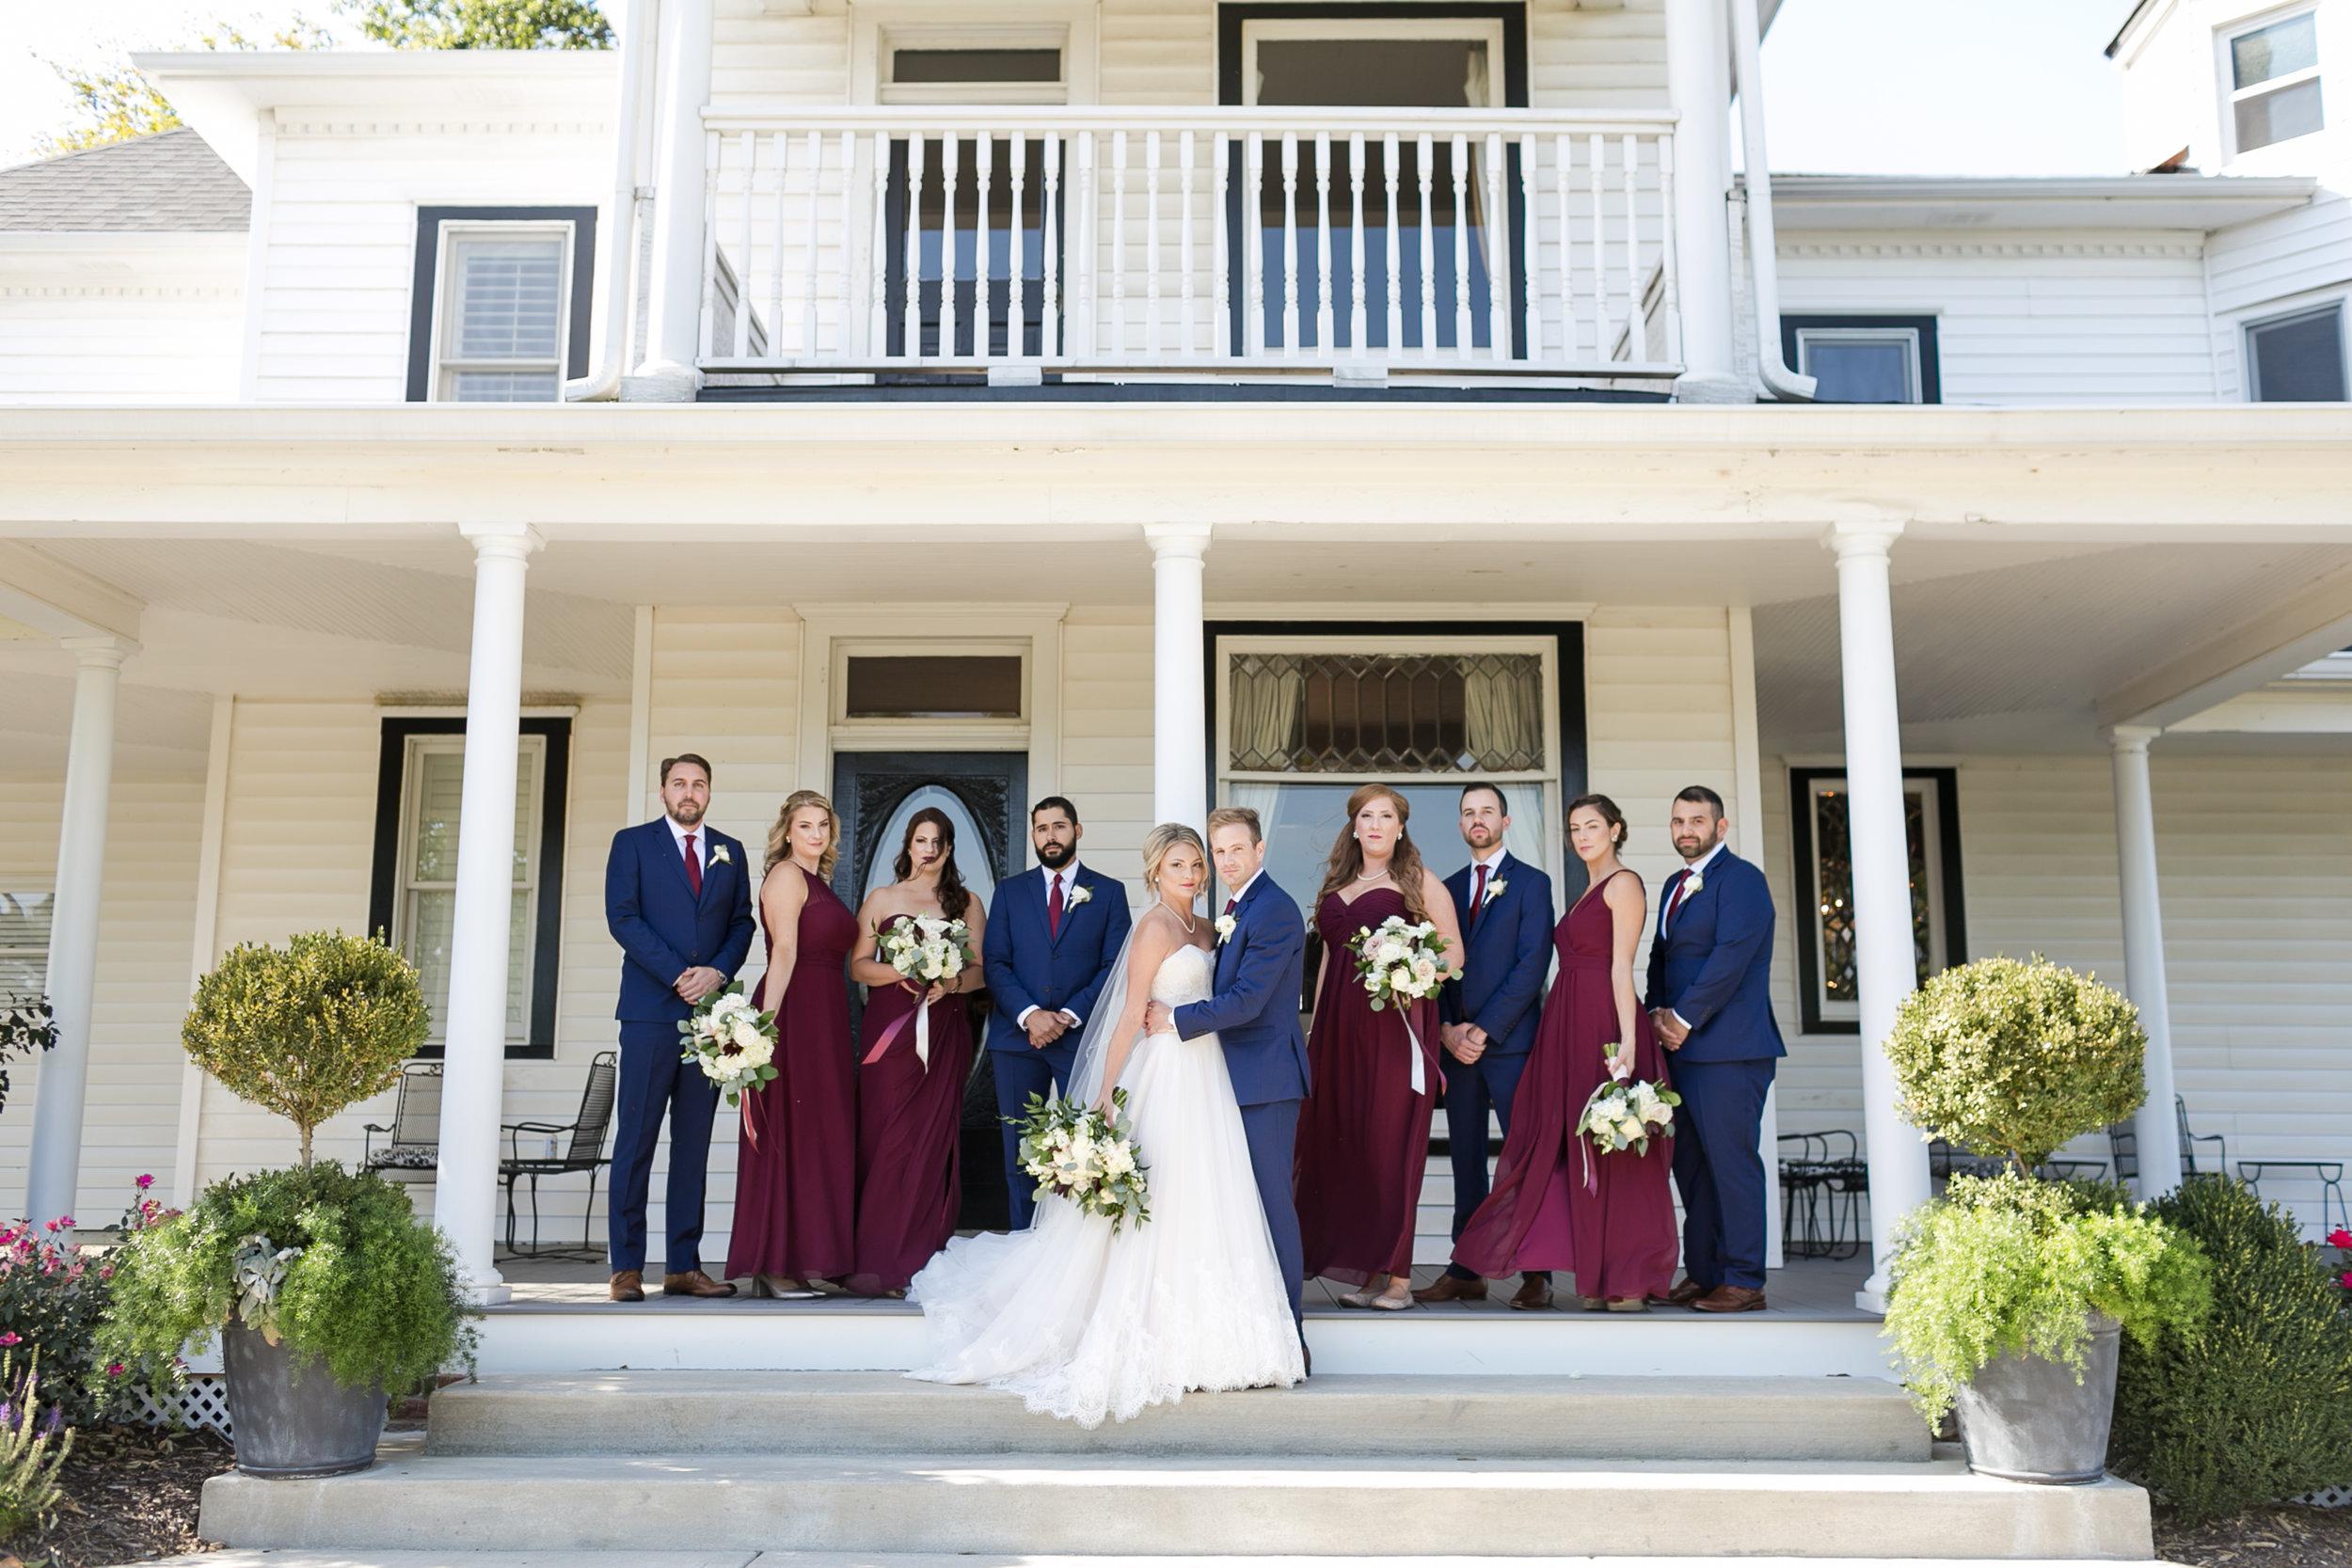 2018-1890-Event-Weddings-JanaMarie-0361.jpg